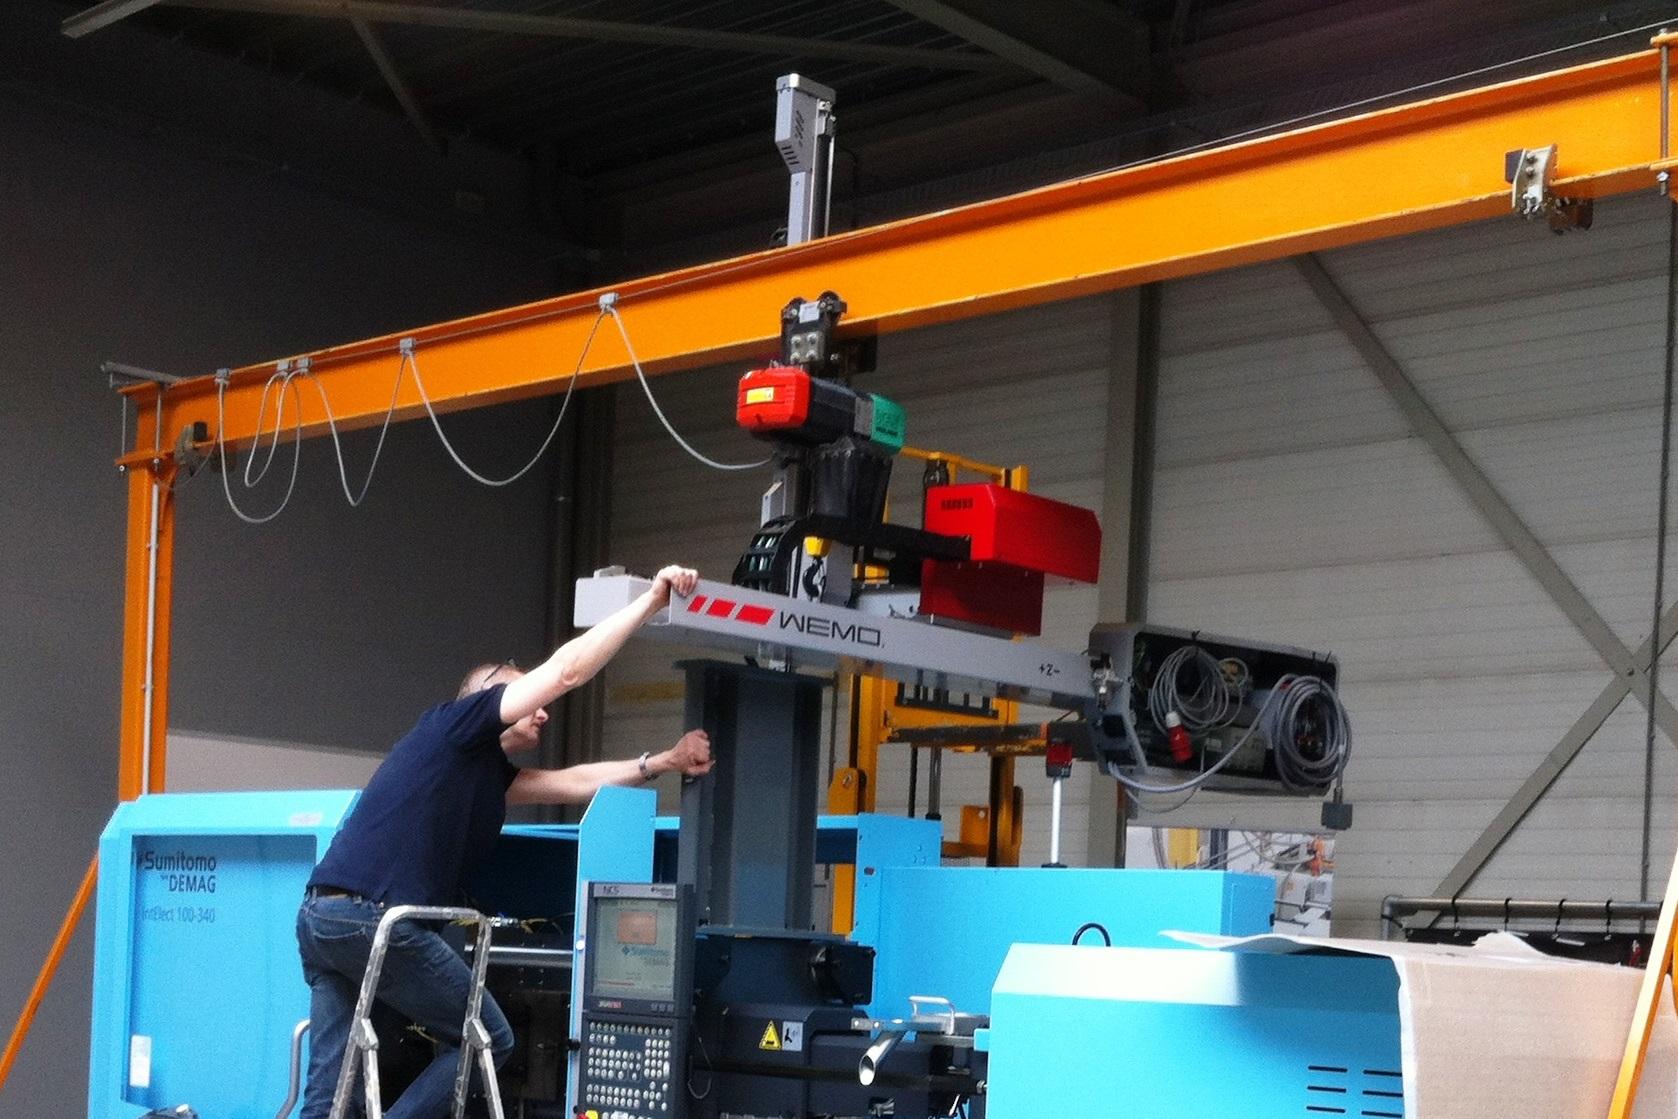 Opbouw Wemo robot op Sumitomo Demag IntElect 100